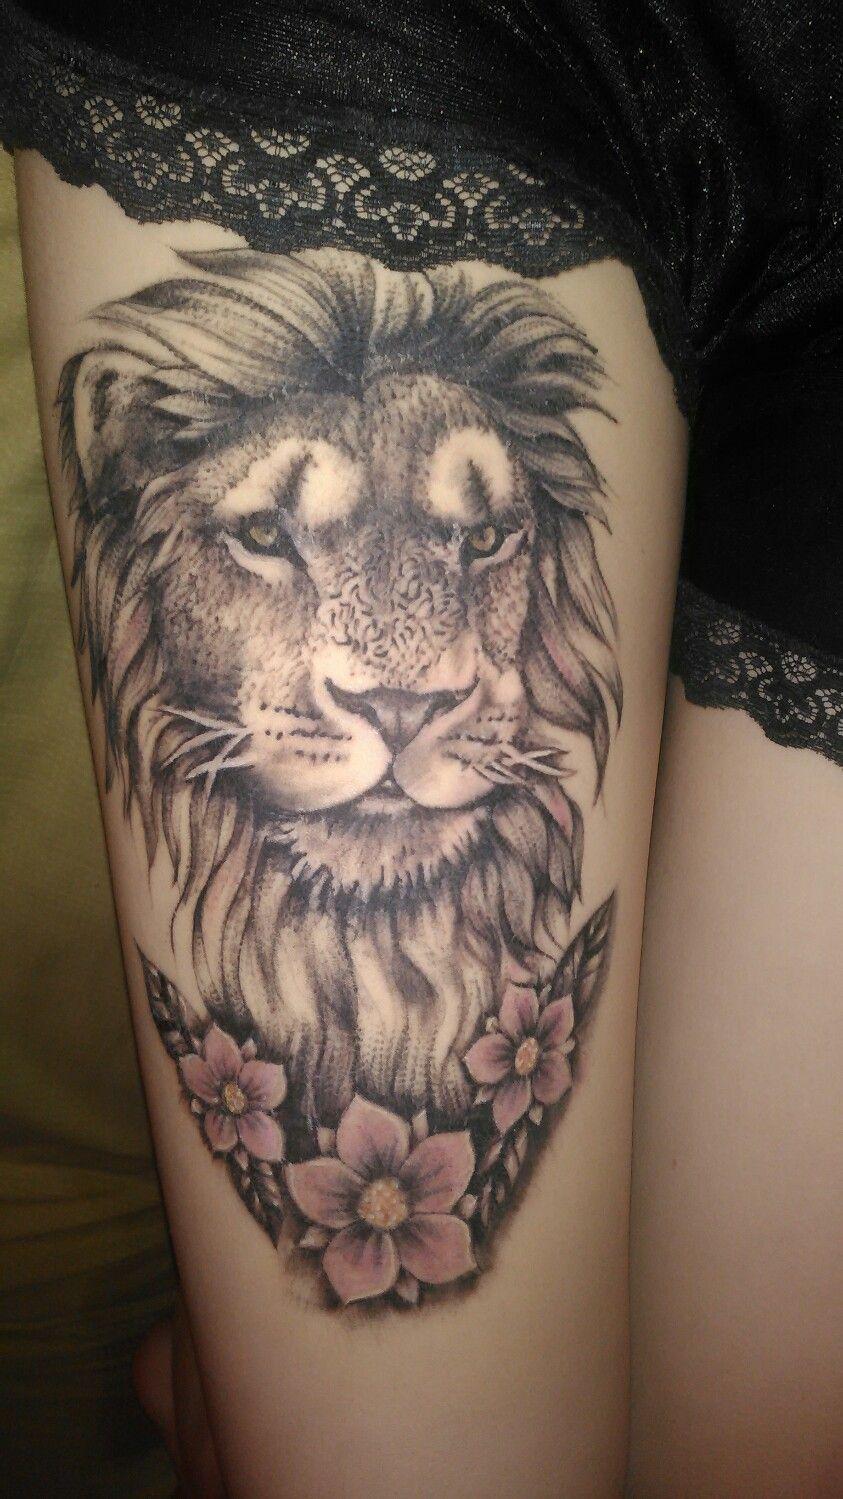 Lion Tattoo Women Thigh Tatuajes León Mujeres Muslo Tatoos